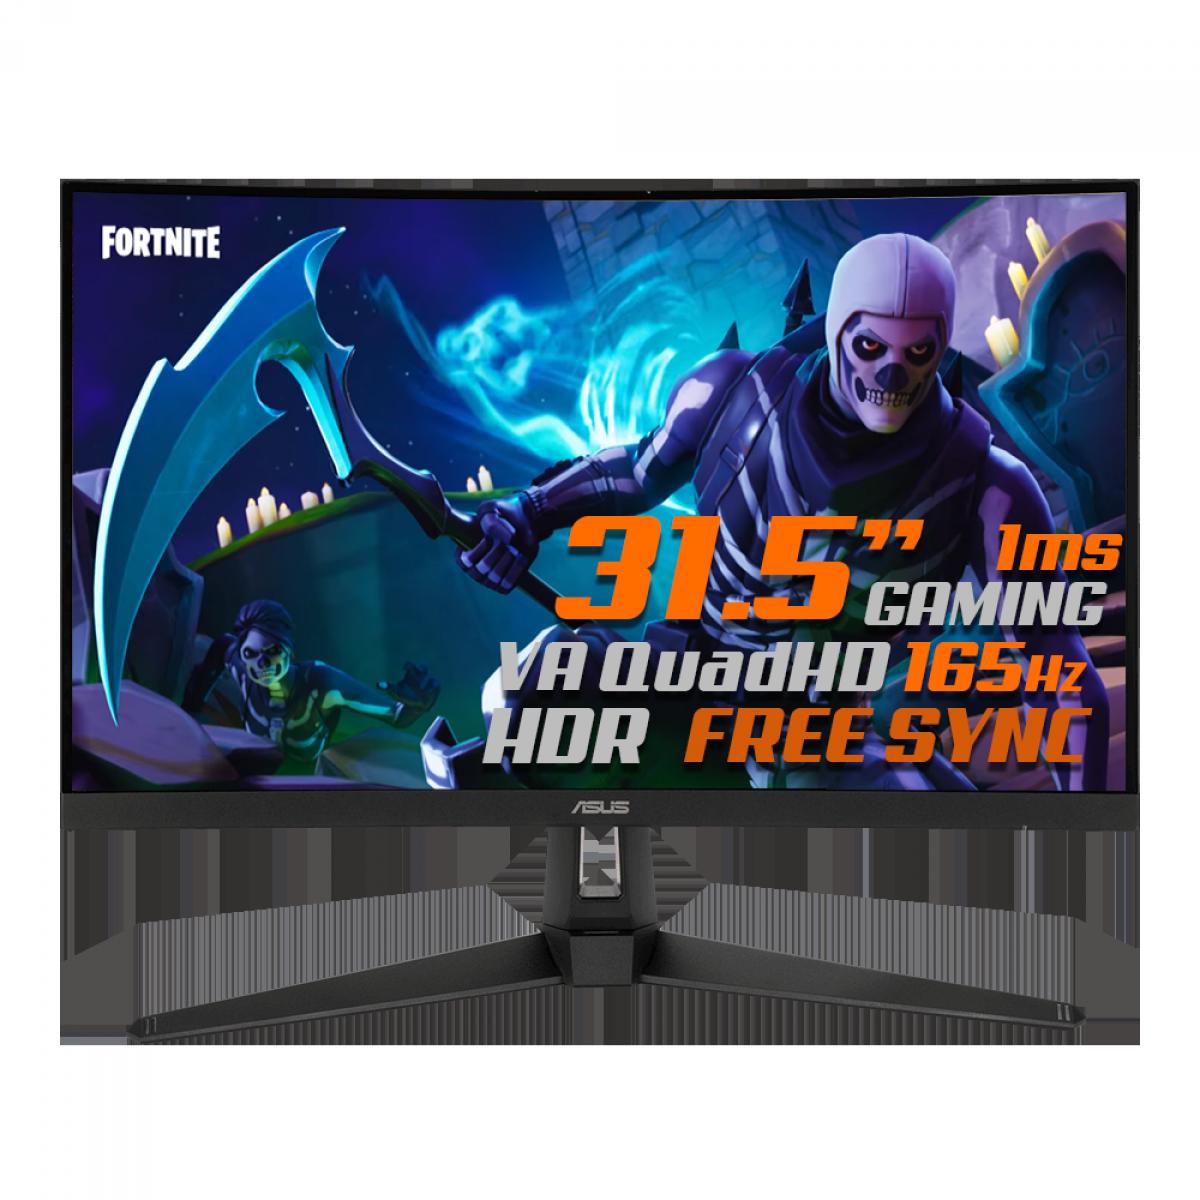 Monitor Gamer ASUS TUF Gaming, 31.5 Pol, Curvo, WideScreen QuadHD, 165Hz, 1ms, HDR, FreeSync Premium, DP/HDMI, VG32VQ1B